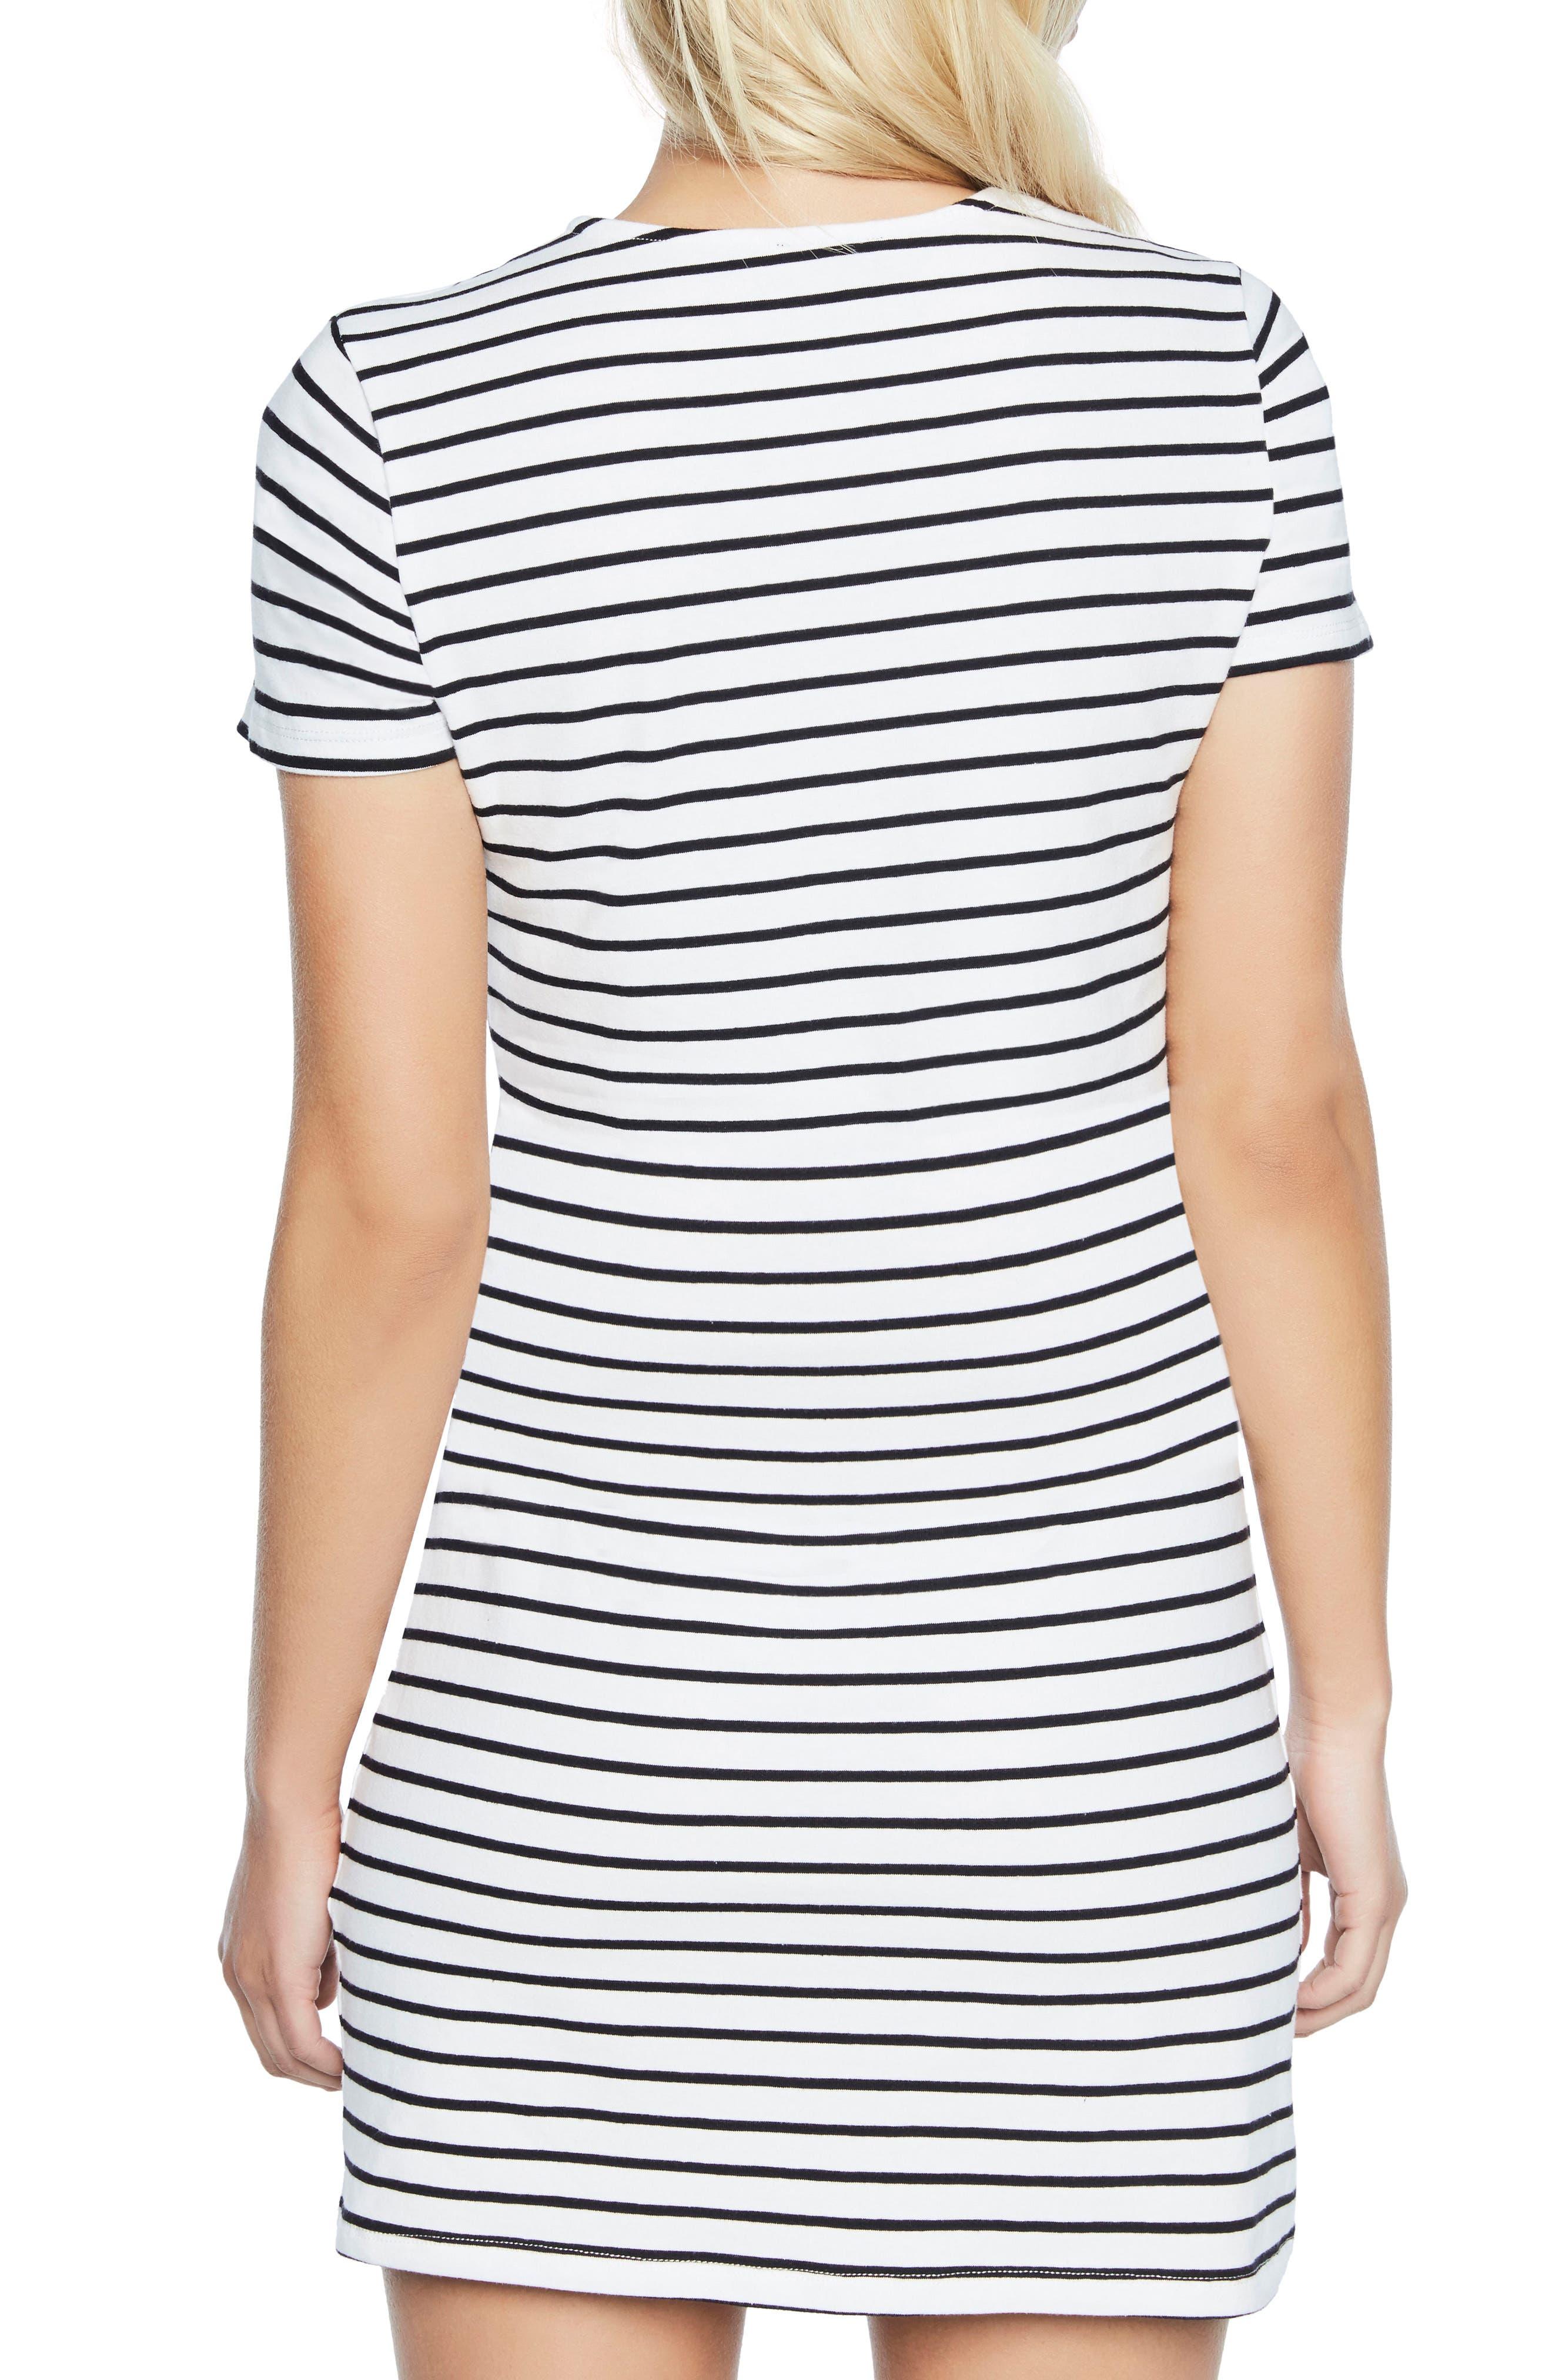 Stripe Shift Dress,                             Alternate thumbnail 2, color,                             Black/ White Stripe